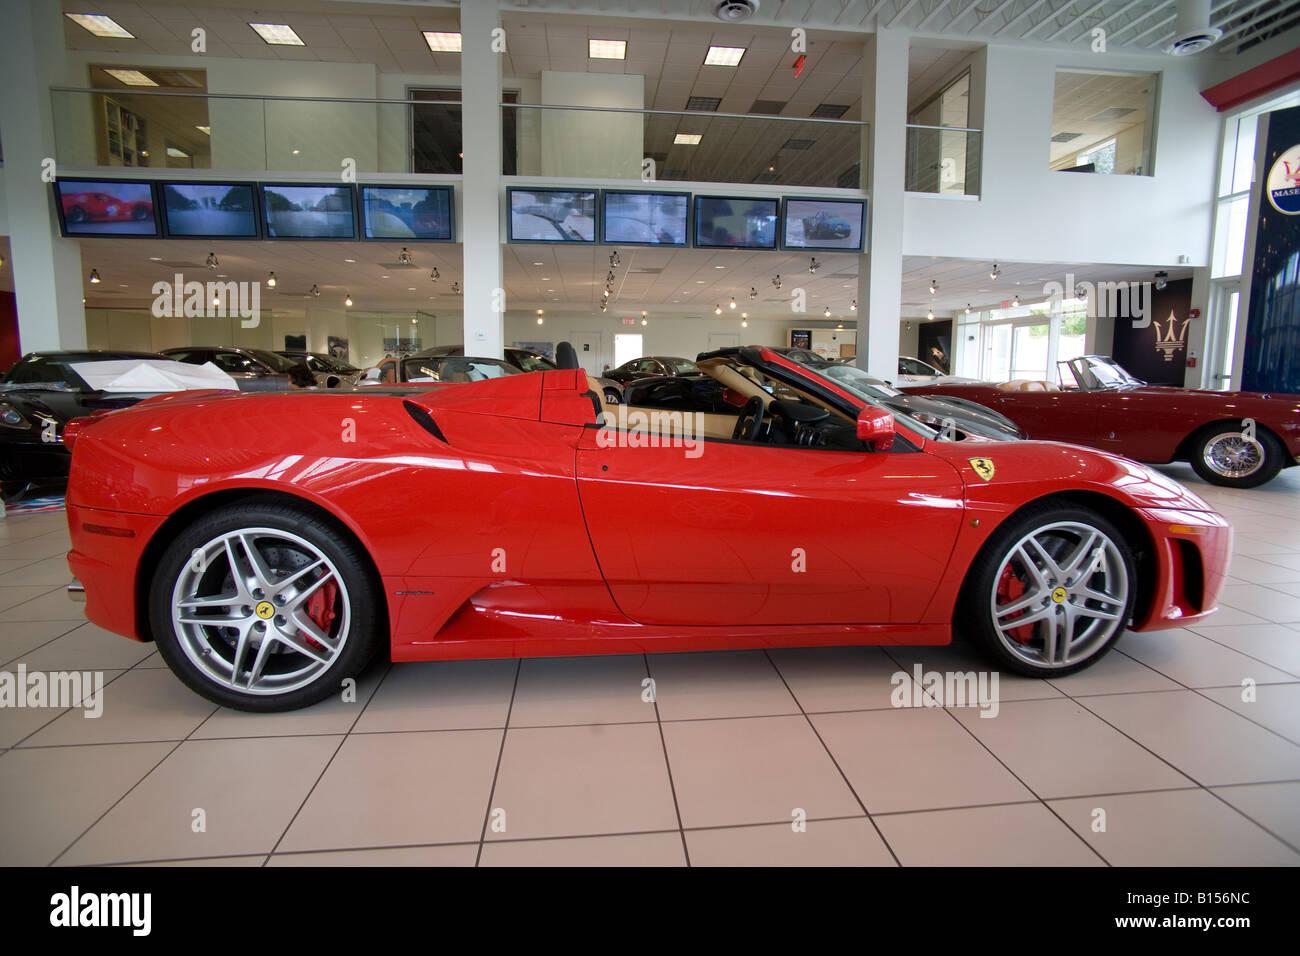 Ferrari Dealership Nc >> A 2008 Ferrari Model 460 In A Newport Beach Ca Dealer S